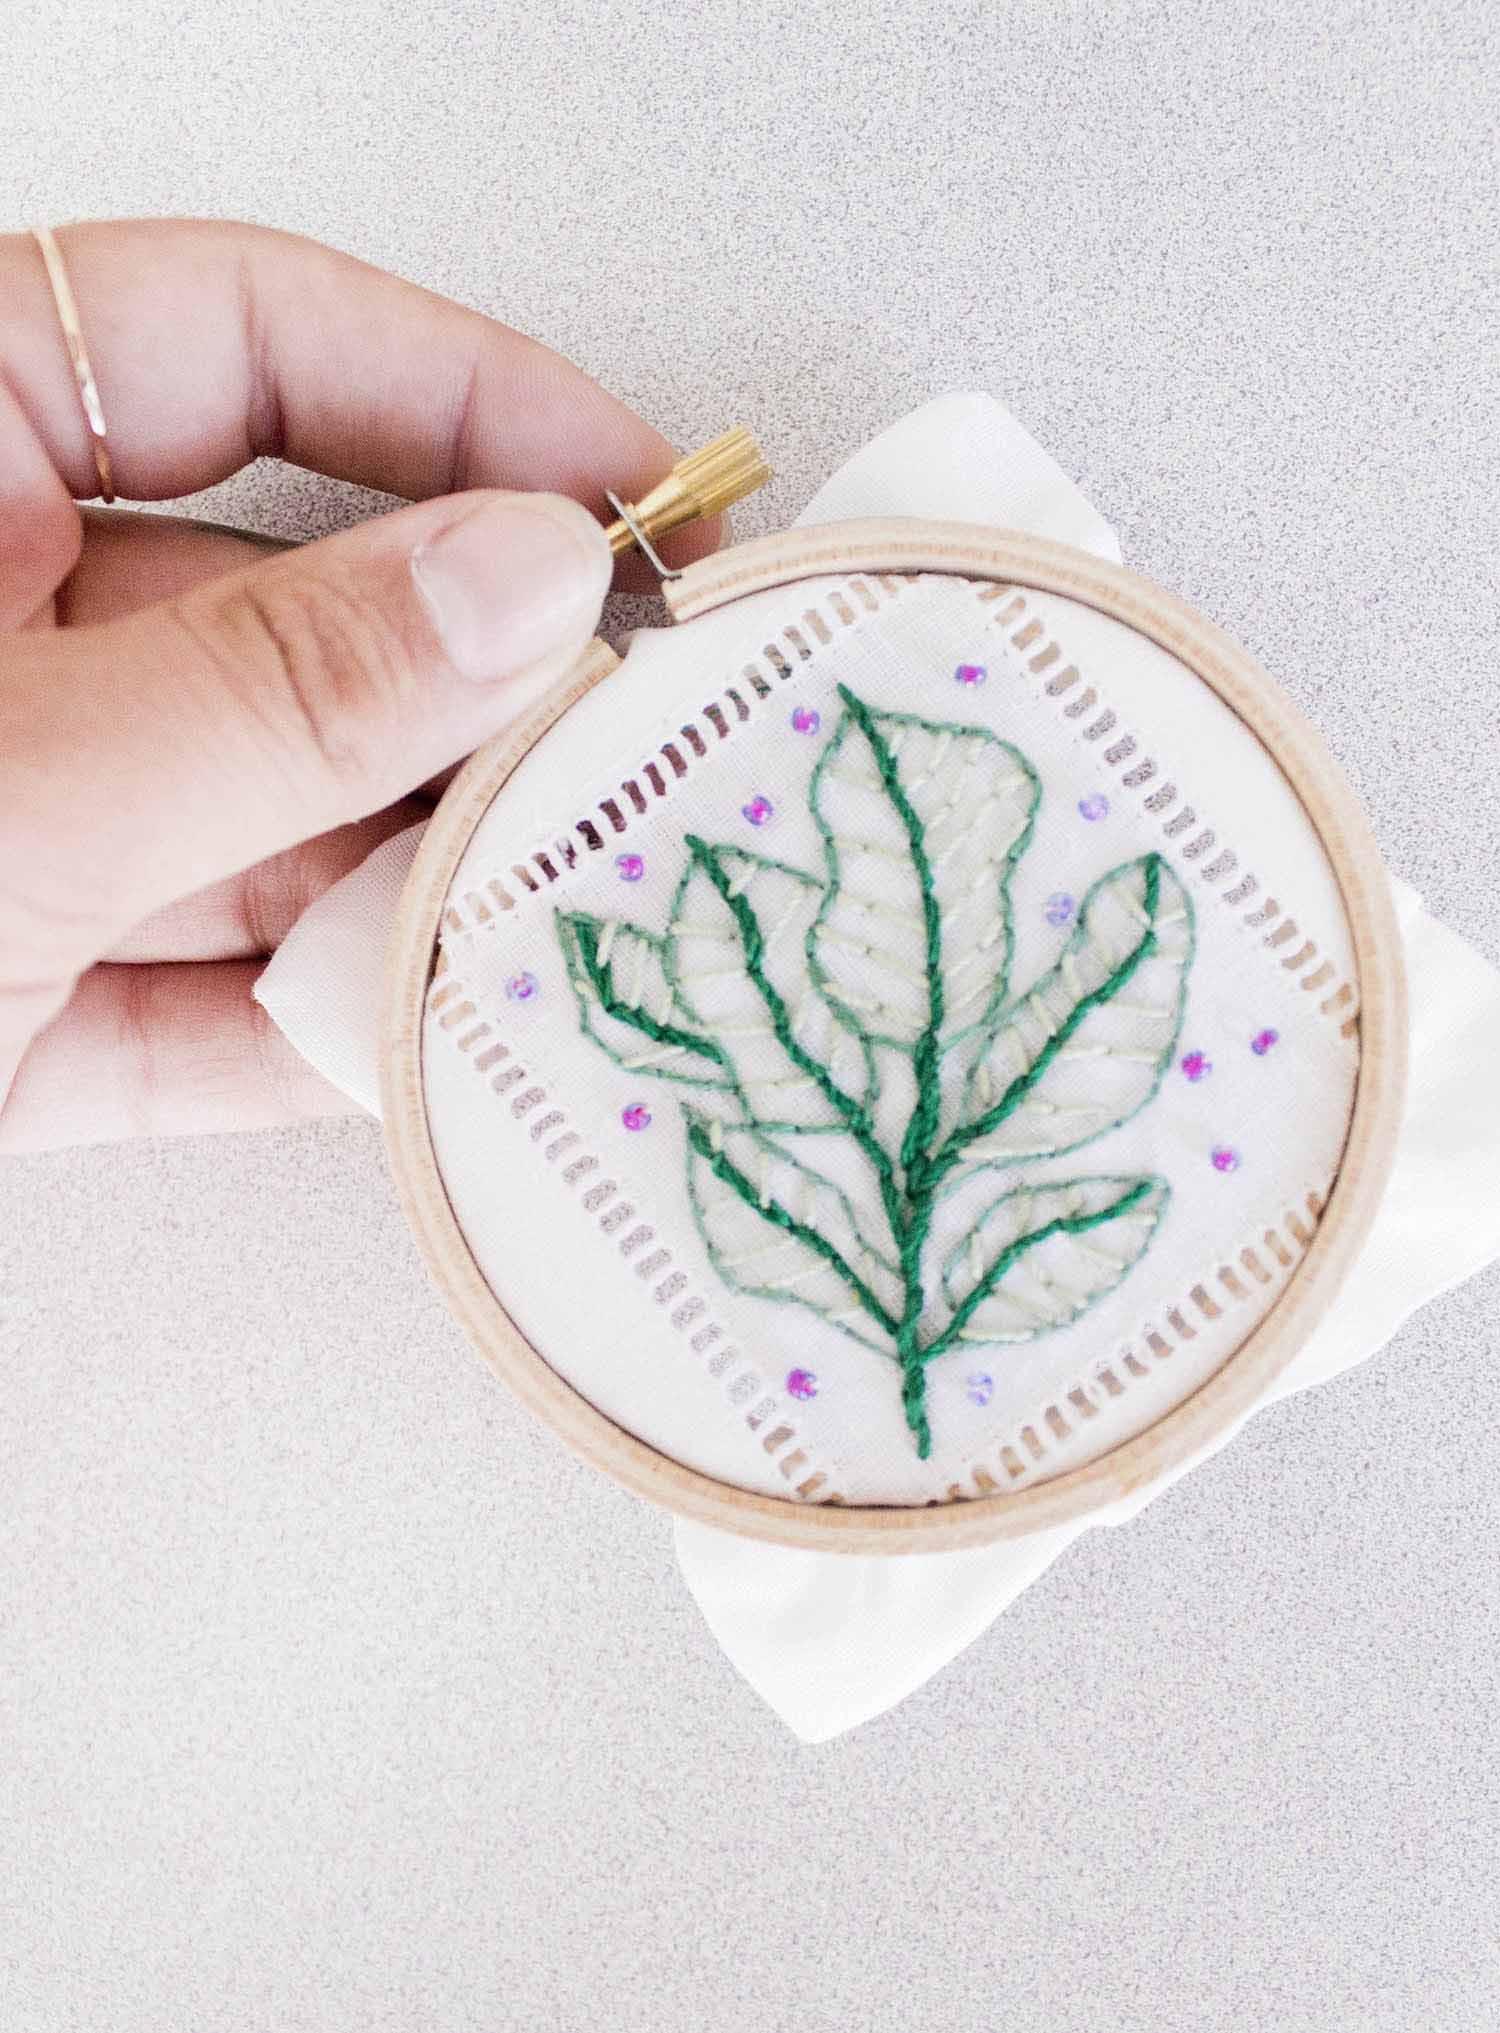 embroidery_leaves_2.jpg